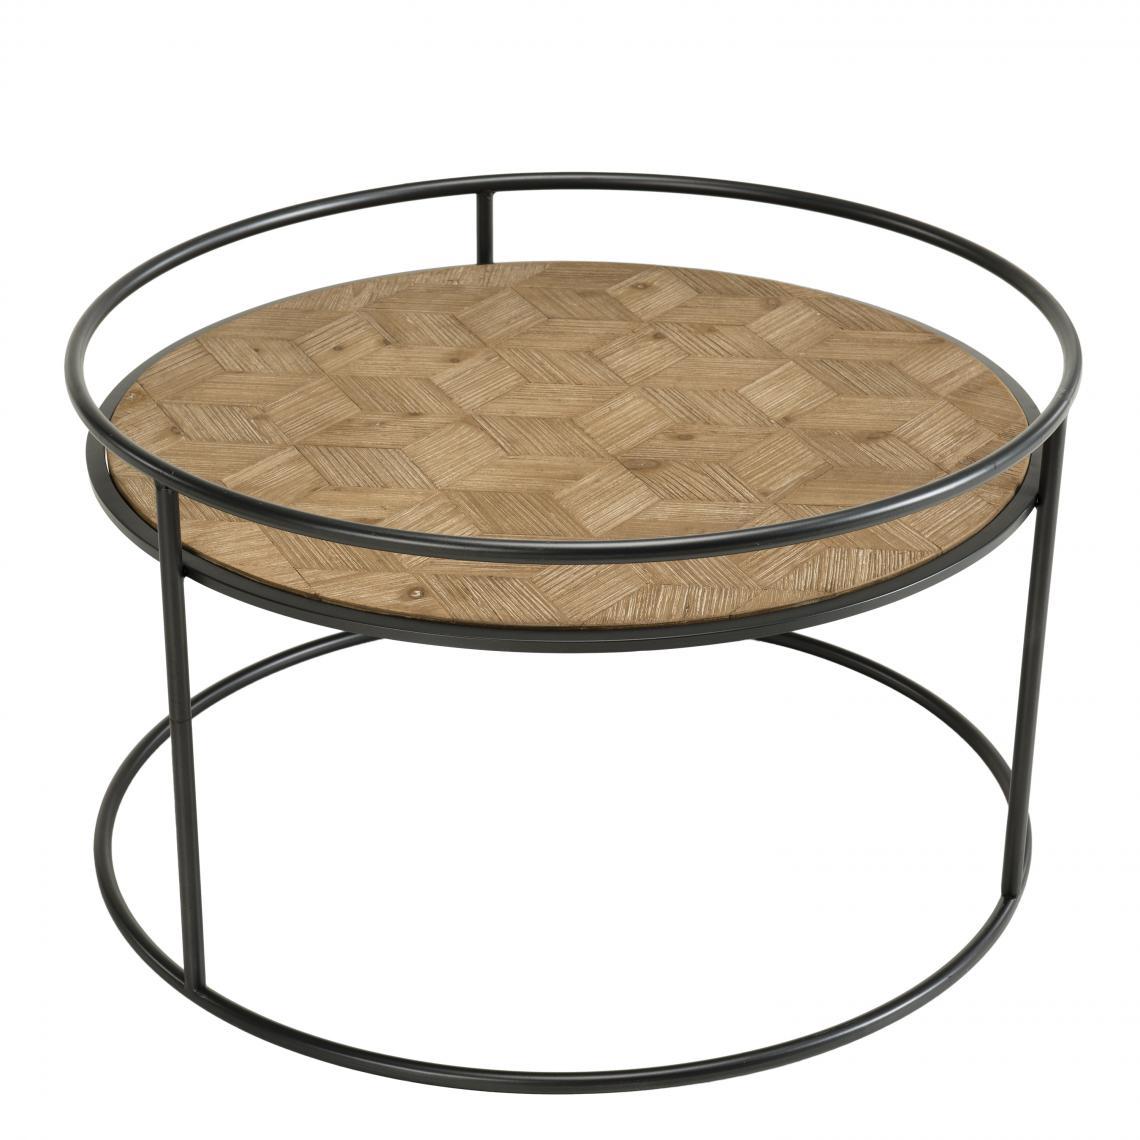 MACABANE Table basse ronde Sapin et métal - ELYNA